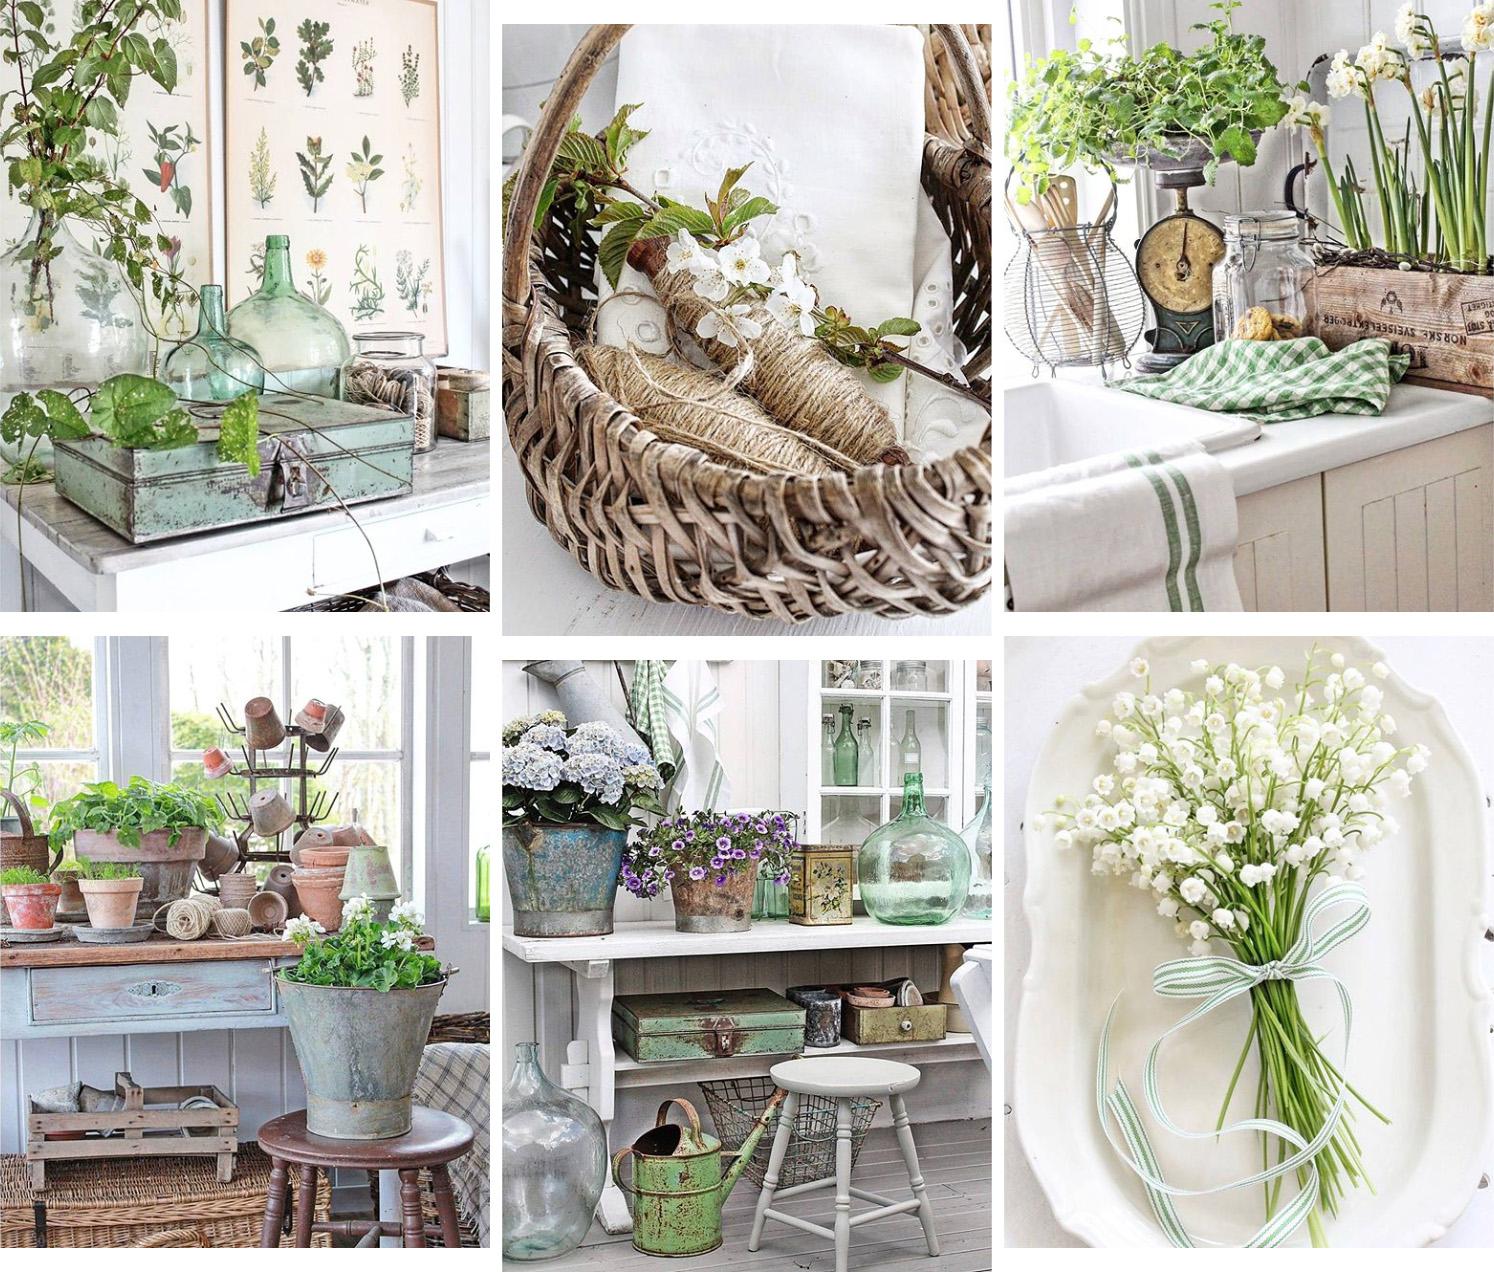 A primavera rinasce il mio animo green shabby chic interiors for Idee giardino shabby